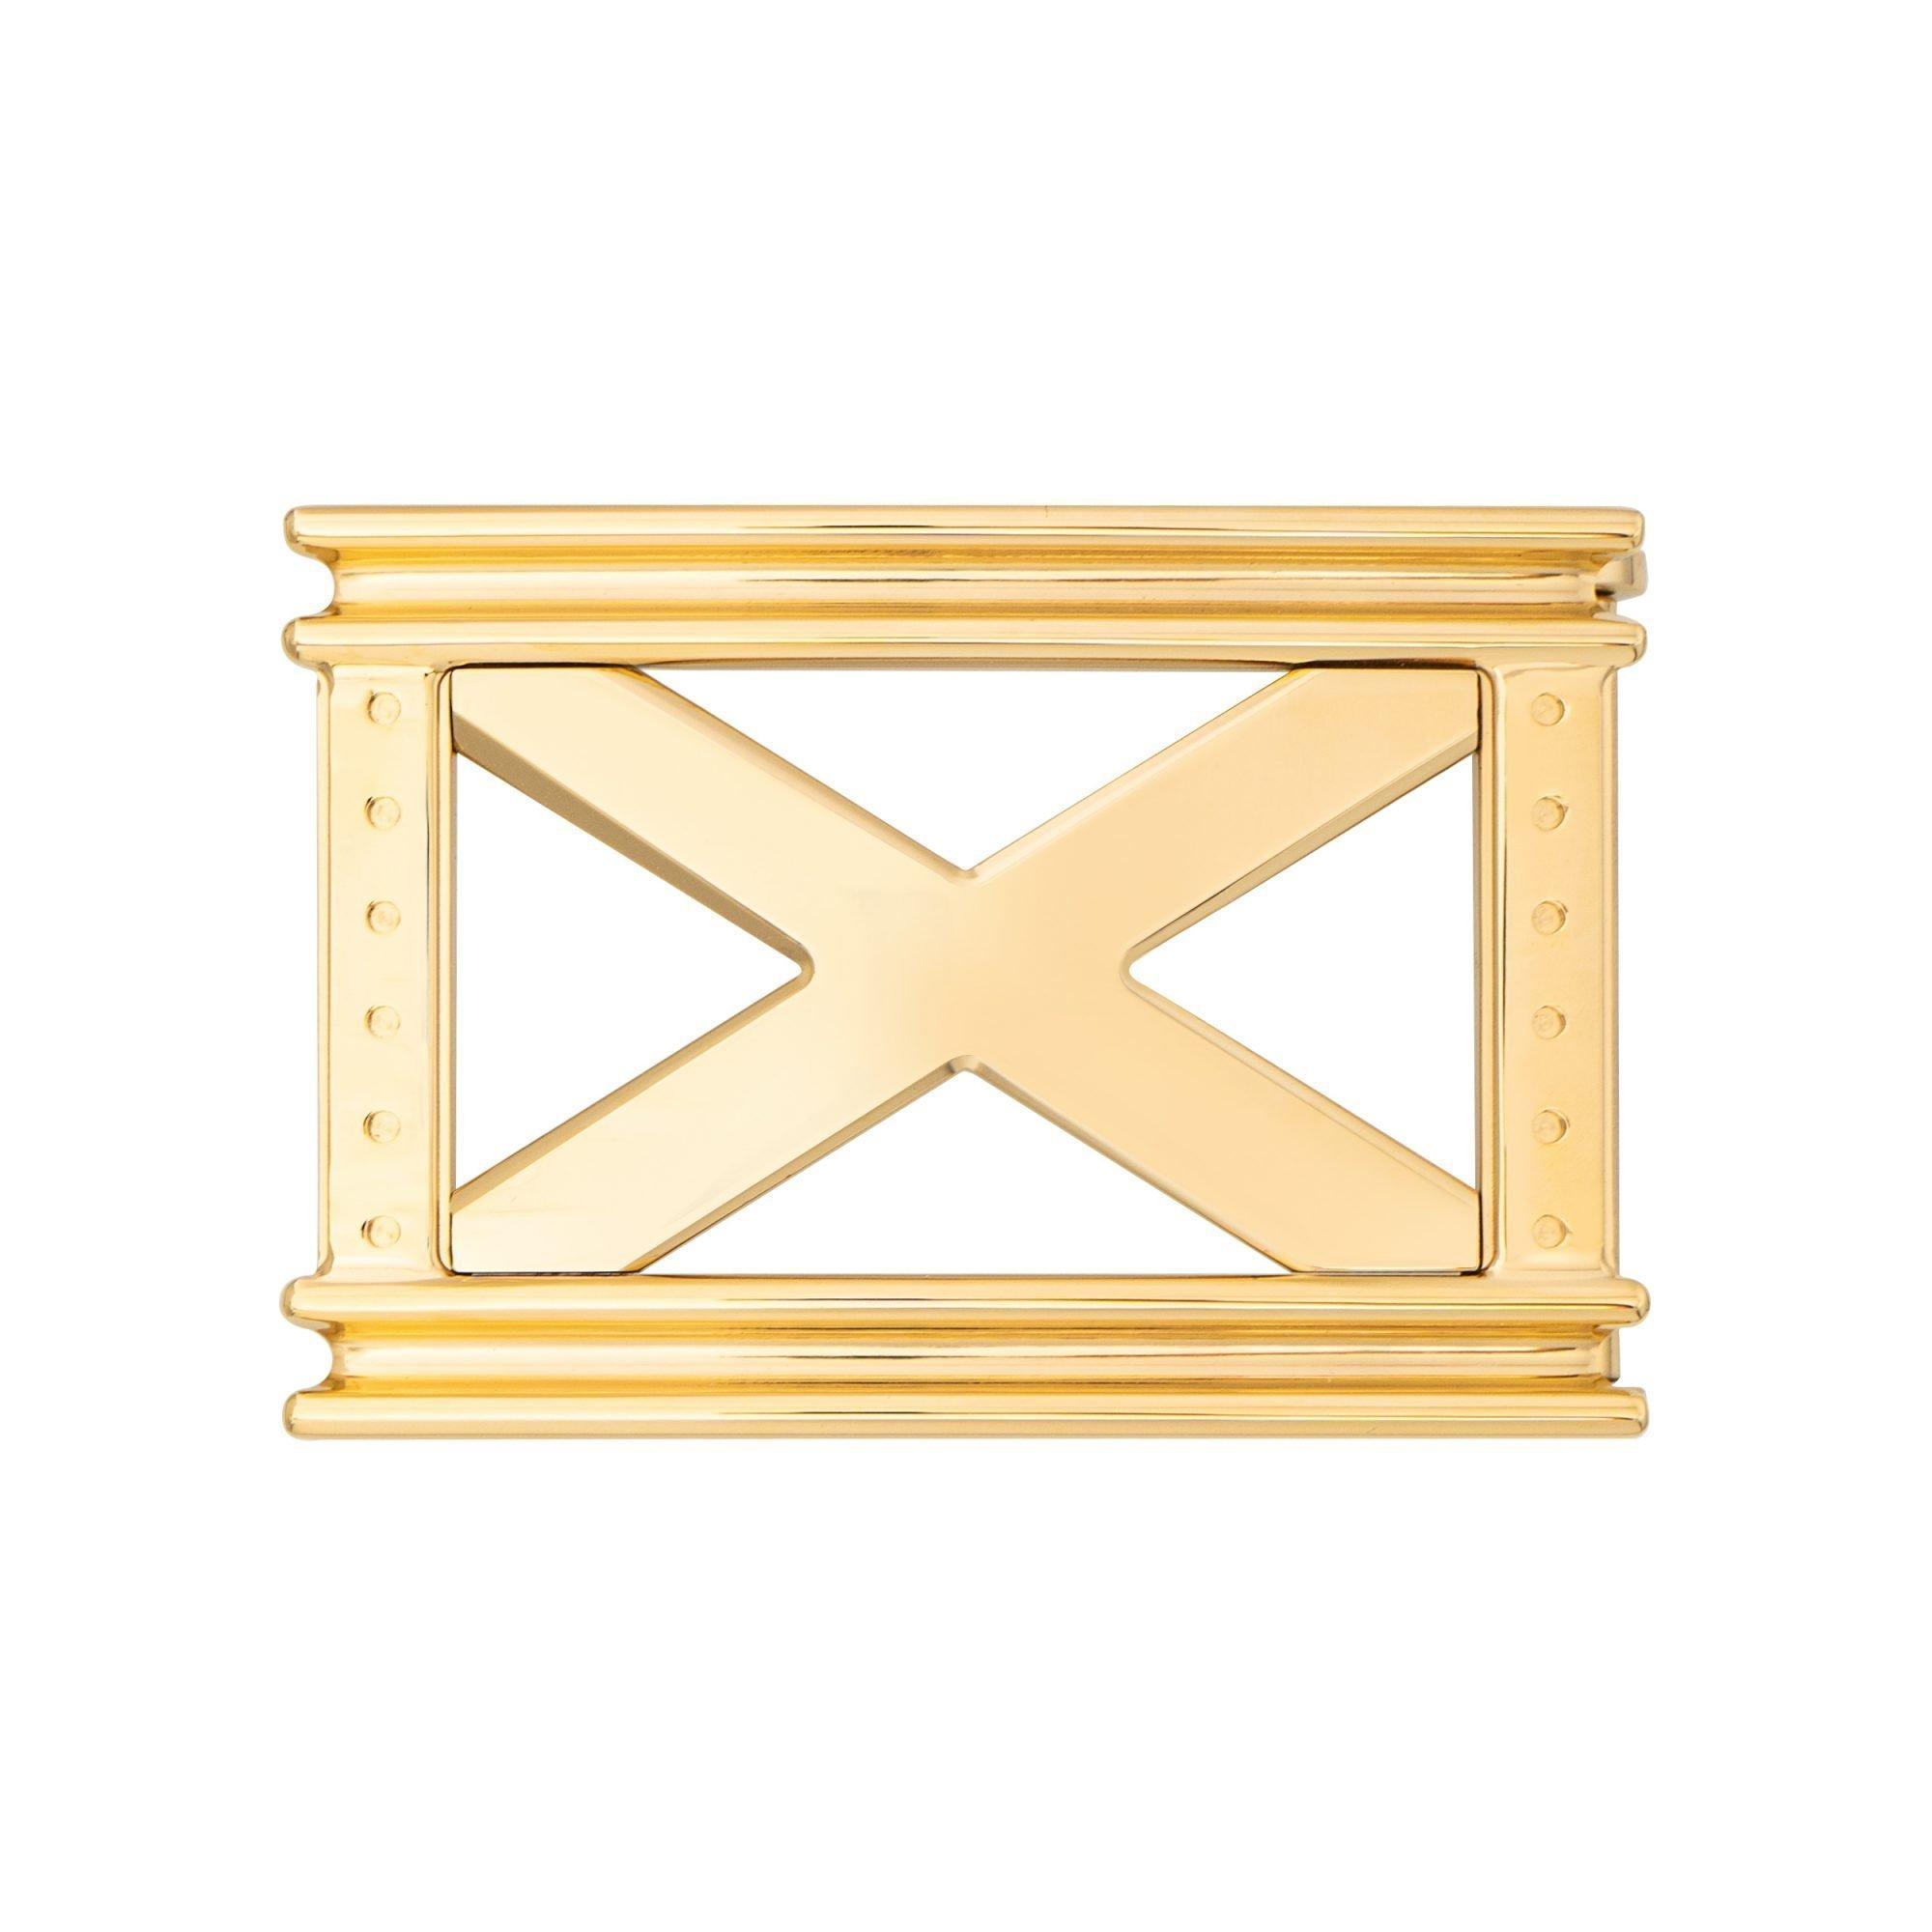 VIKTOR ALEXANDER 38MM STAINLESS STEEL BELT BUCKLE REPERTOIRE X YELLOW GOLD FRONT PROFILE